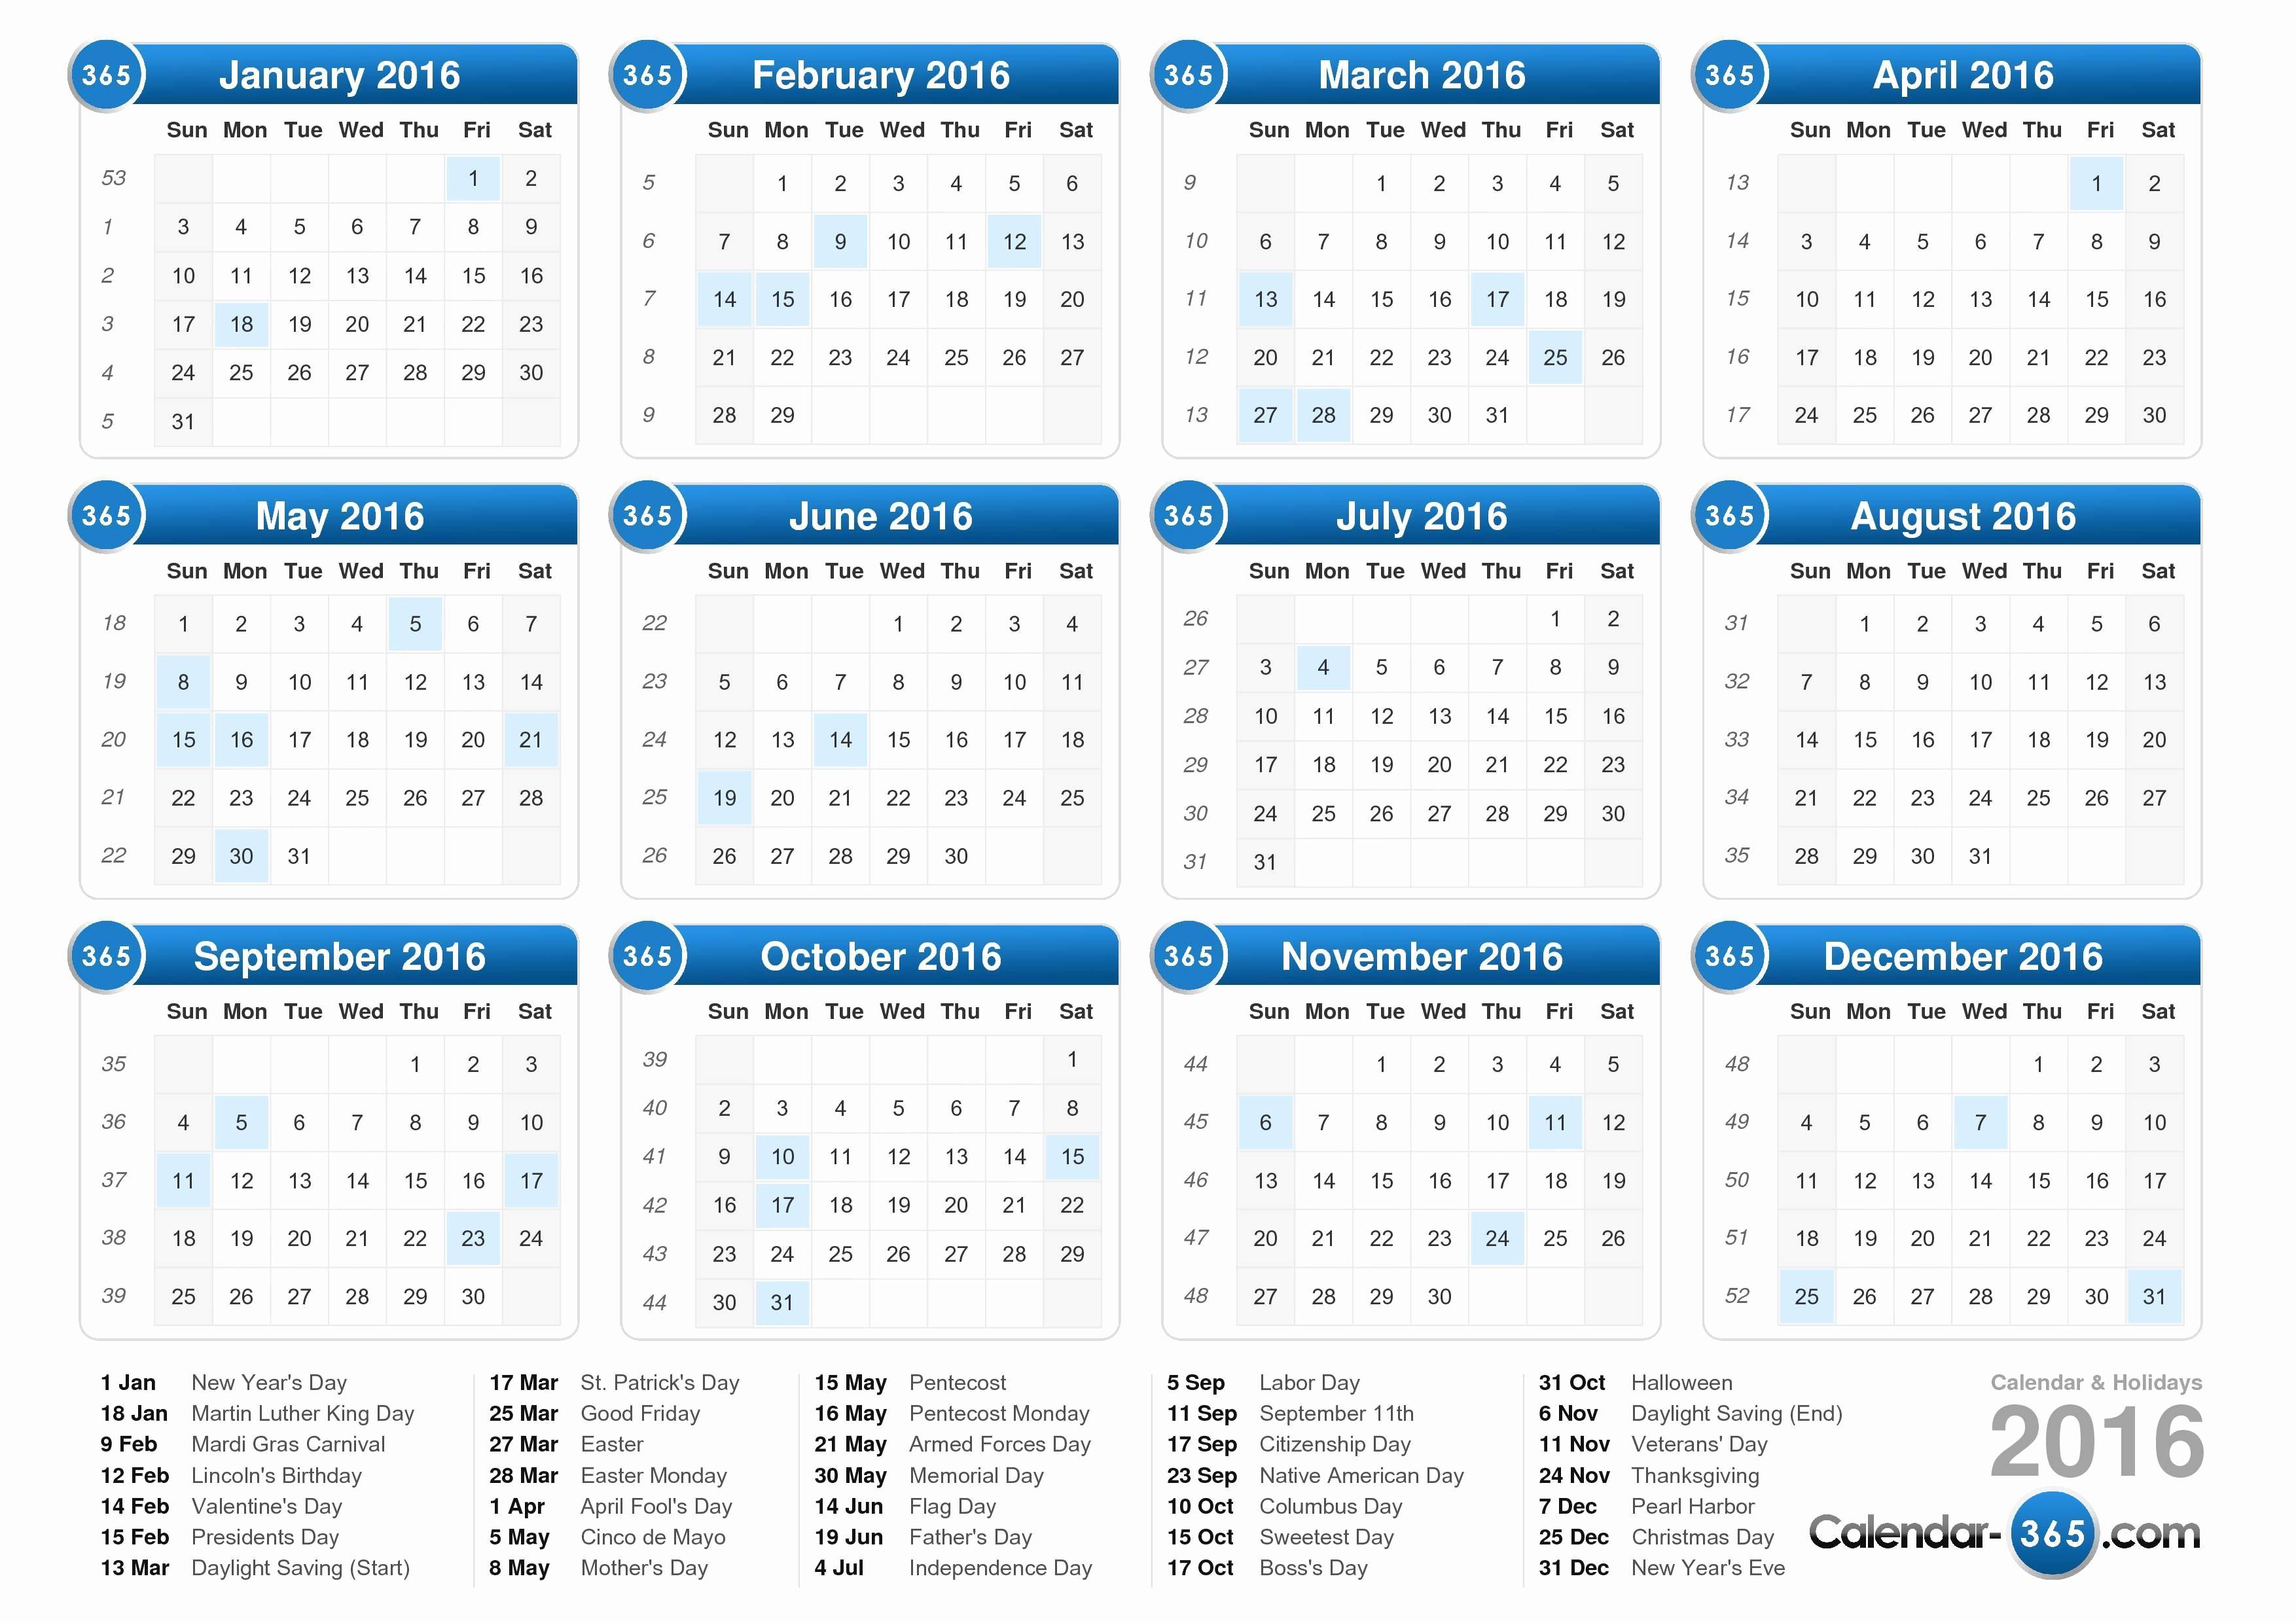 5 Year Calendar Starting 2016 Elegant 2016 Calendar